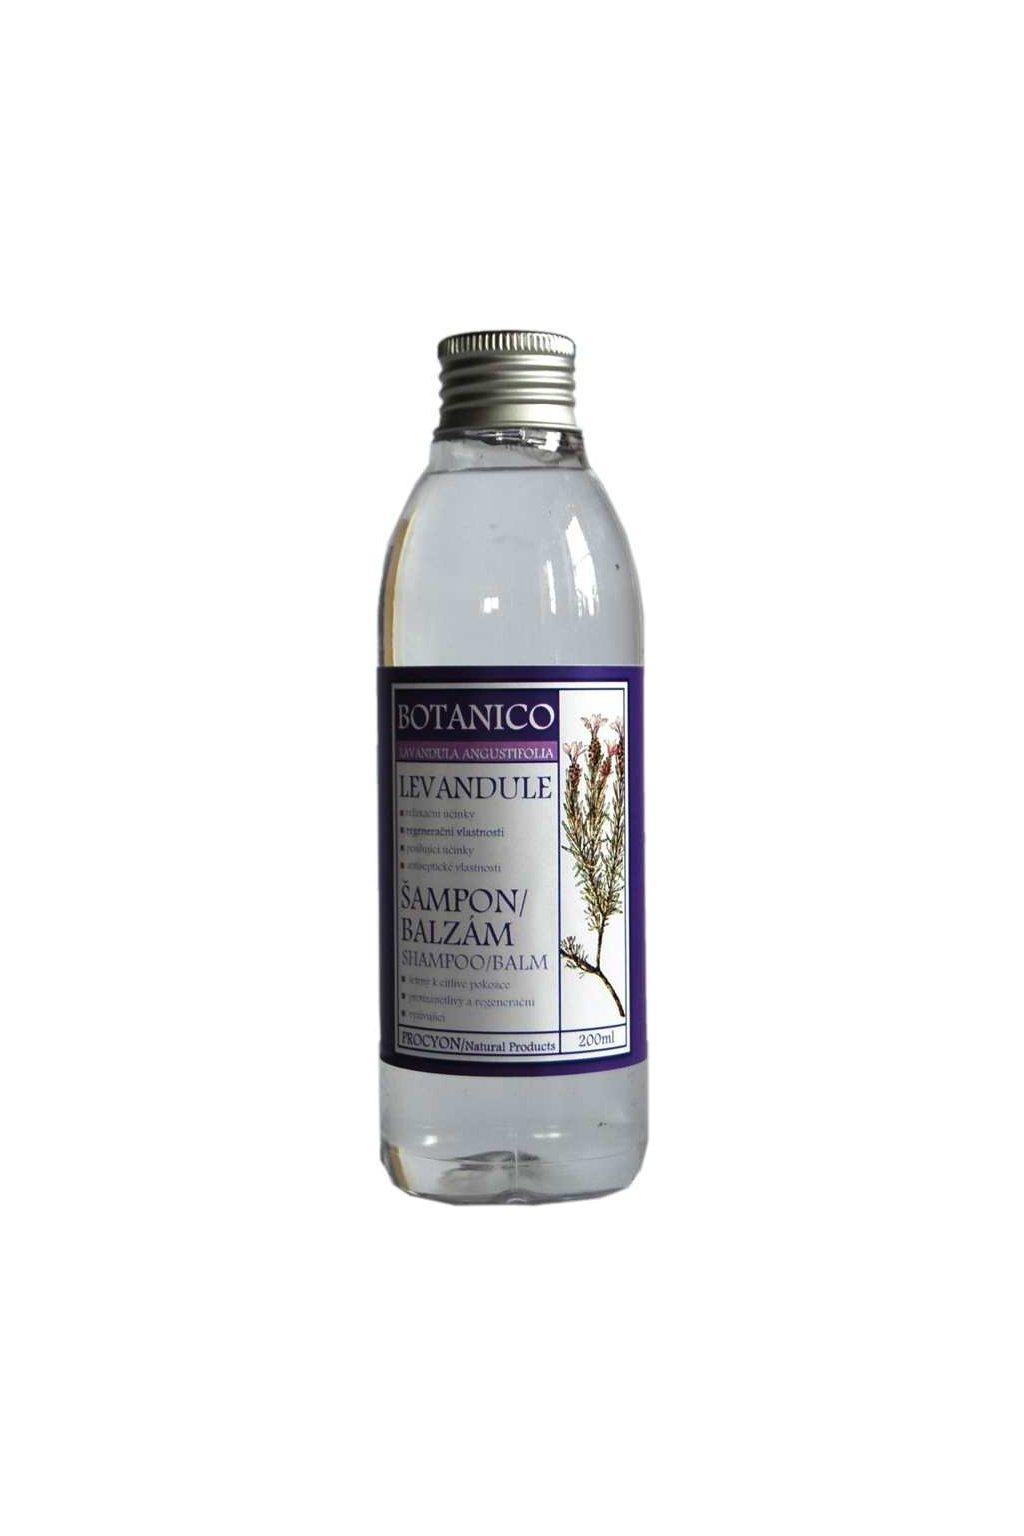 Botanico - Šampon/Balzám - Levandule - 200ml